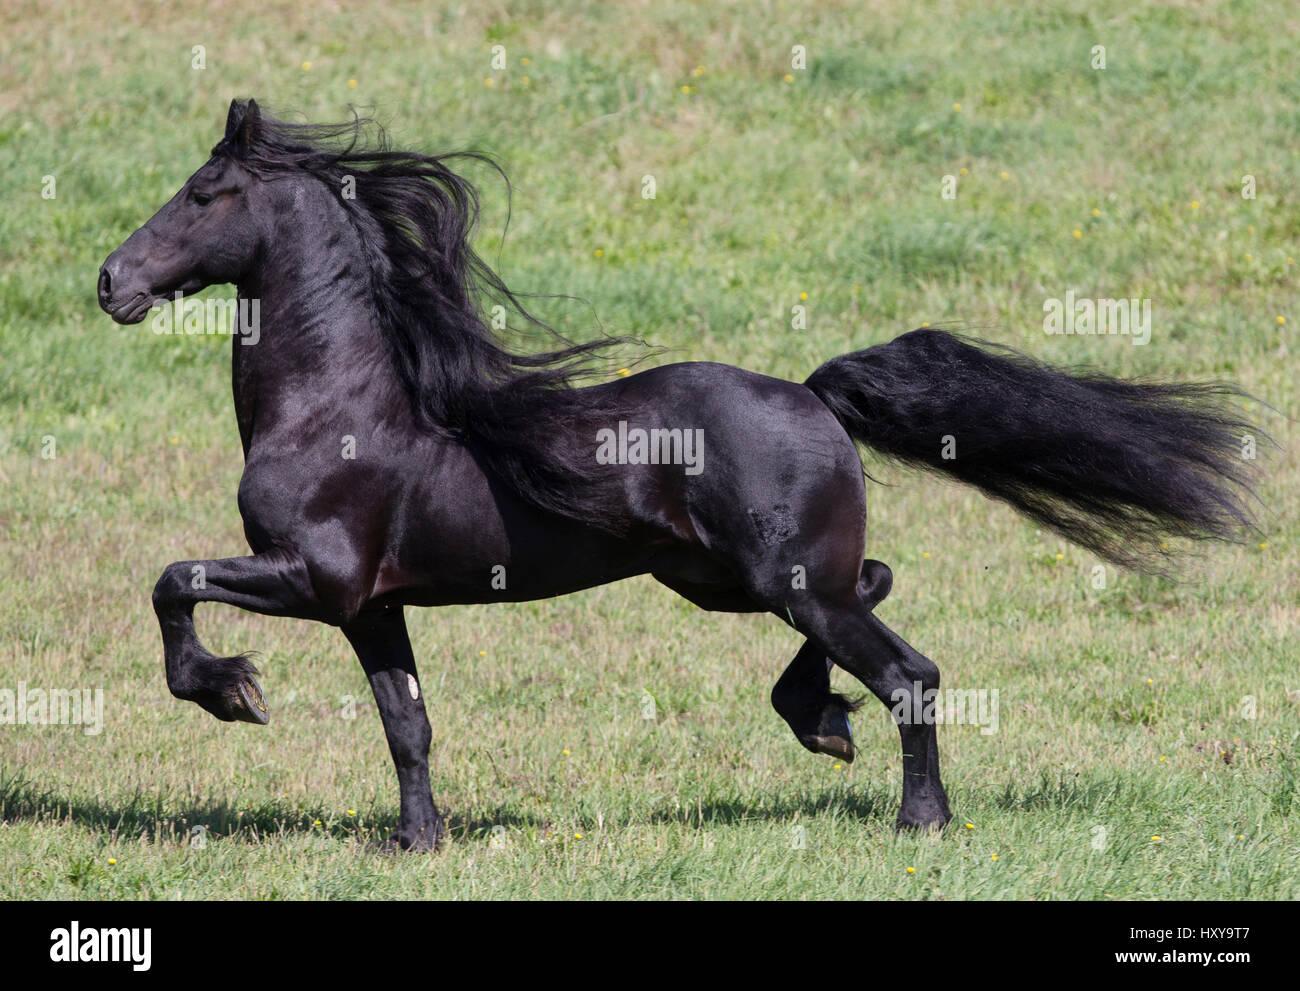 Black Friesian stallion trotting. Ojai, California, USA. - Stock Image